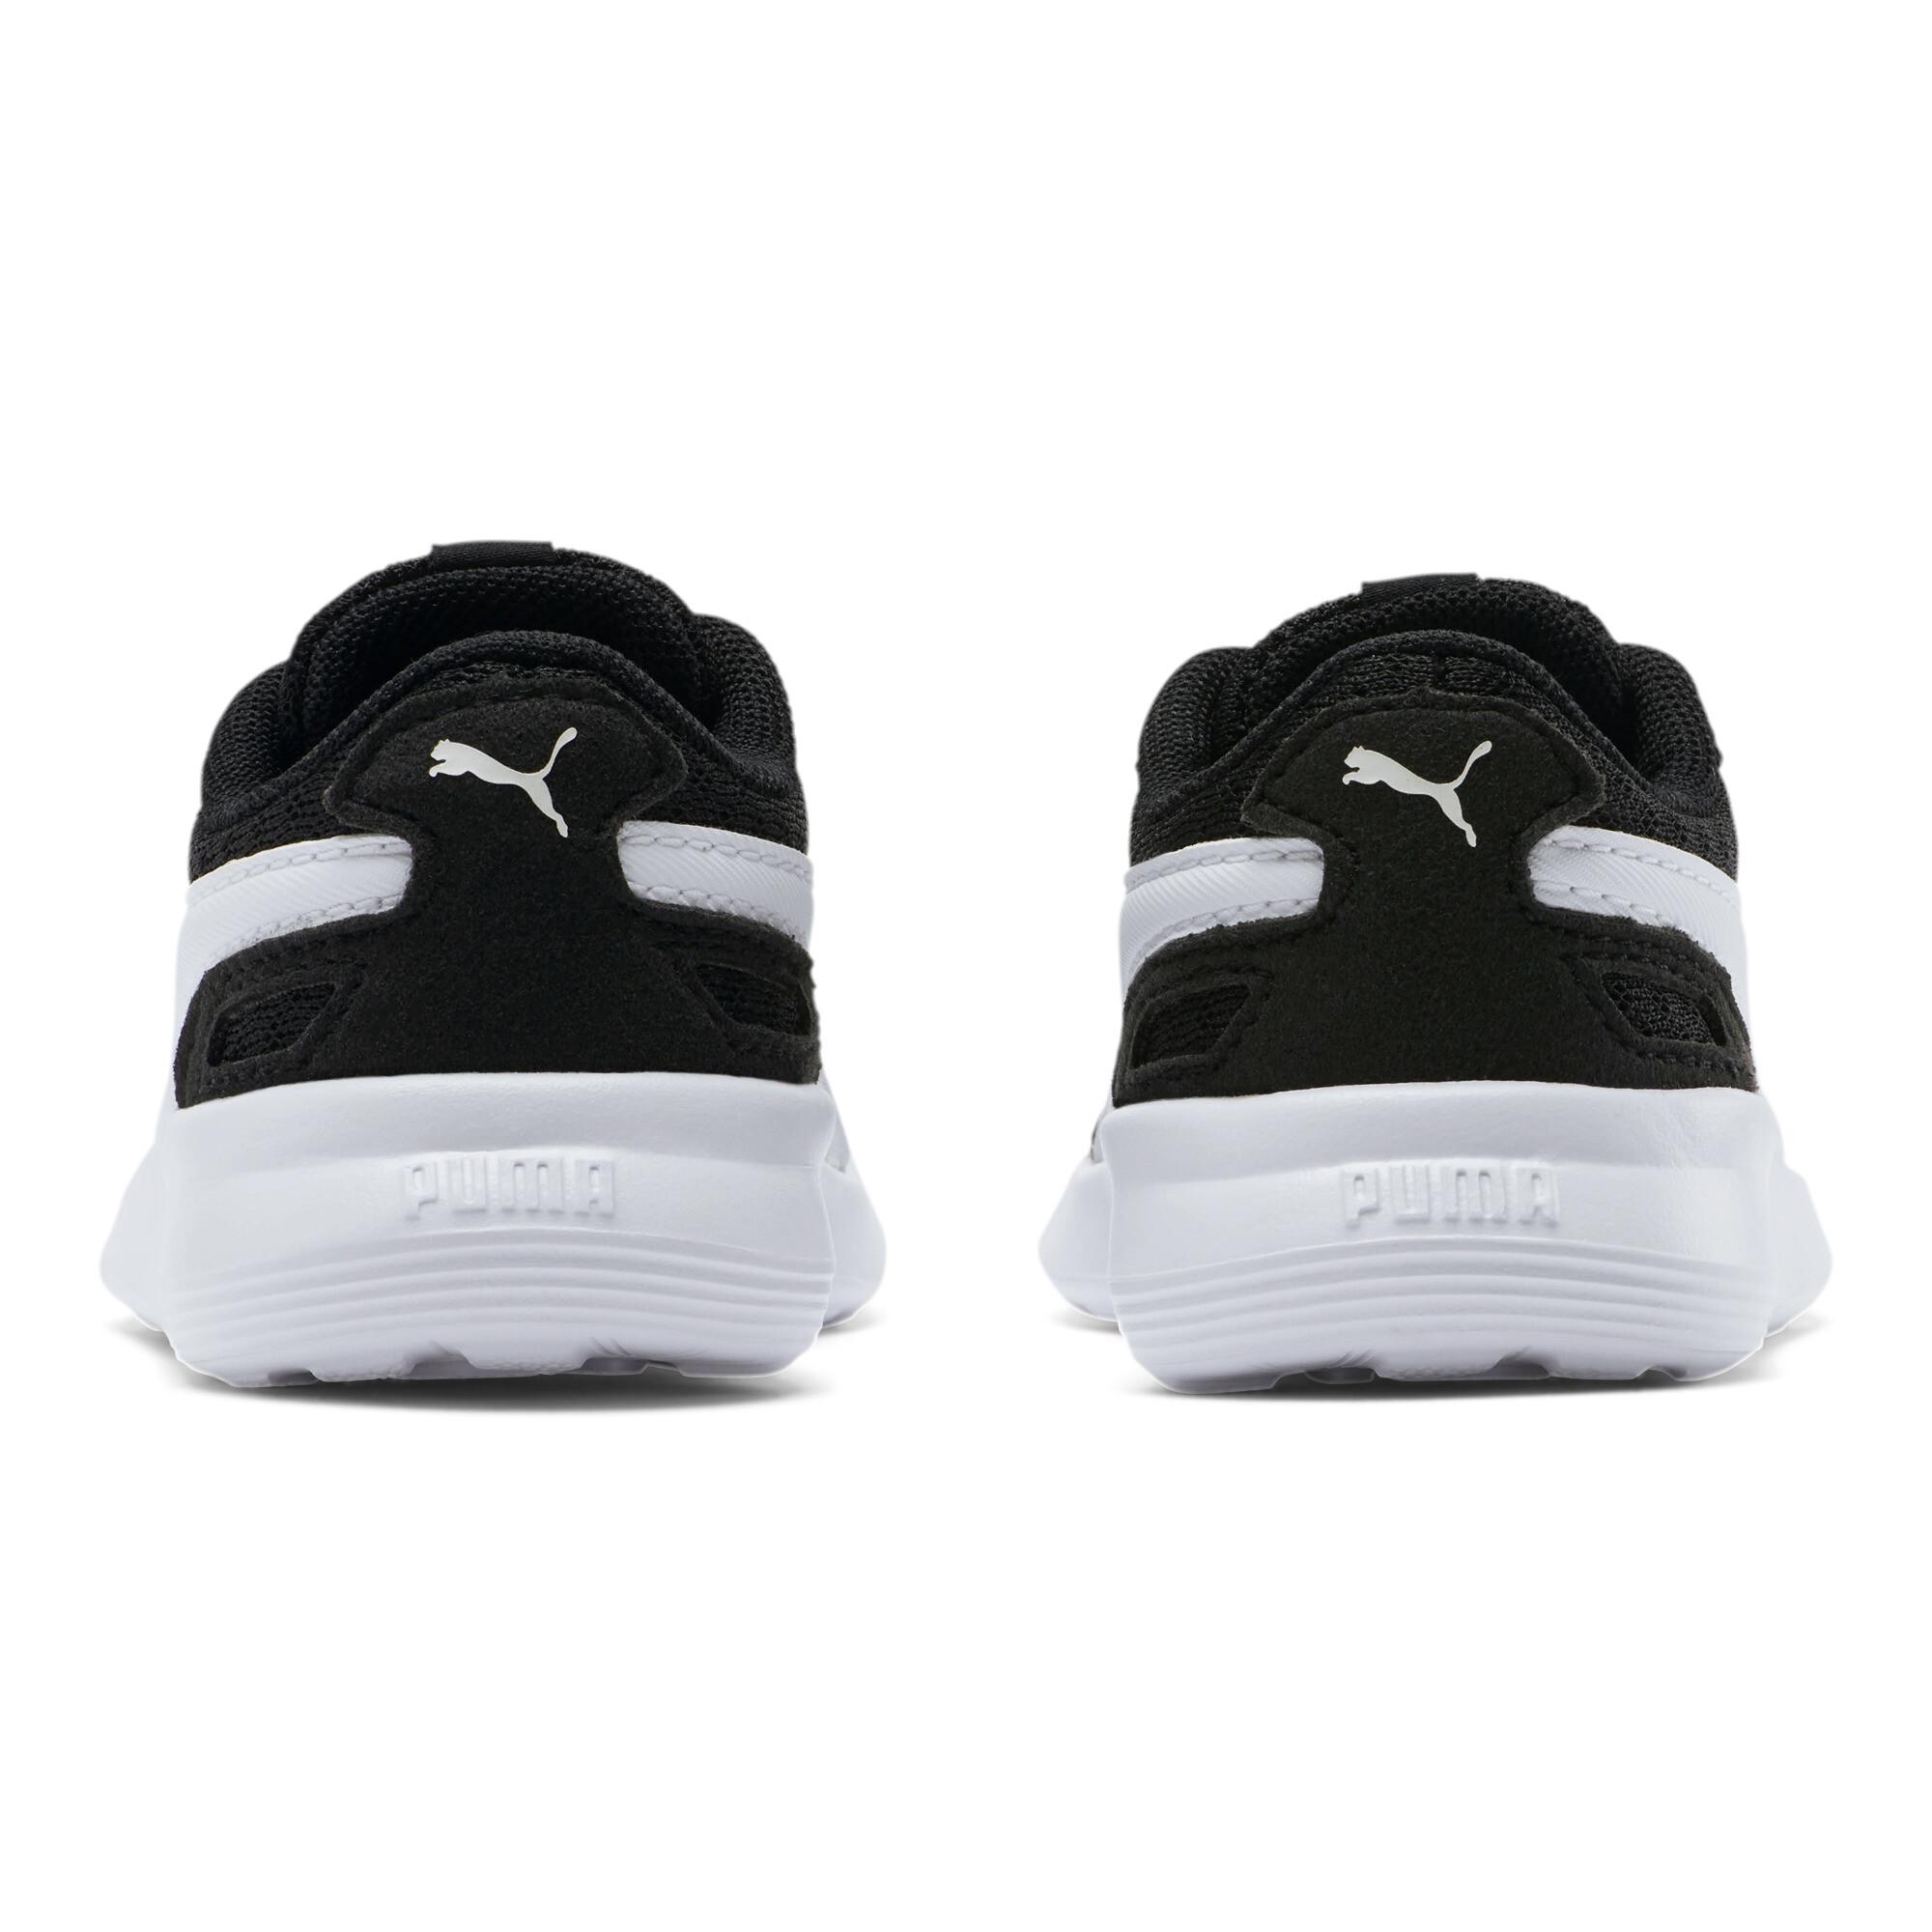 PUMA-ST-Activate-AC-Toddler-Shoes-Kids-Shoe-Kids thumbnail 21